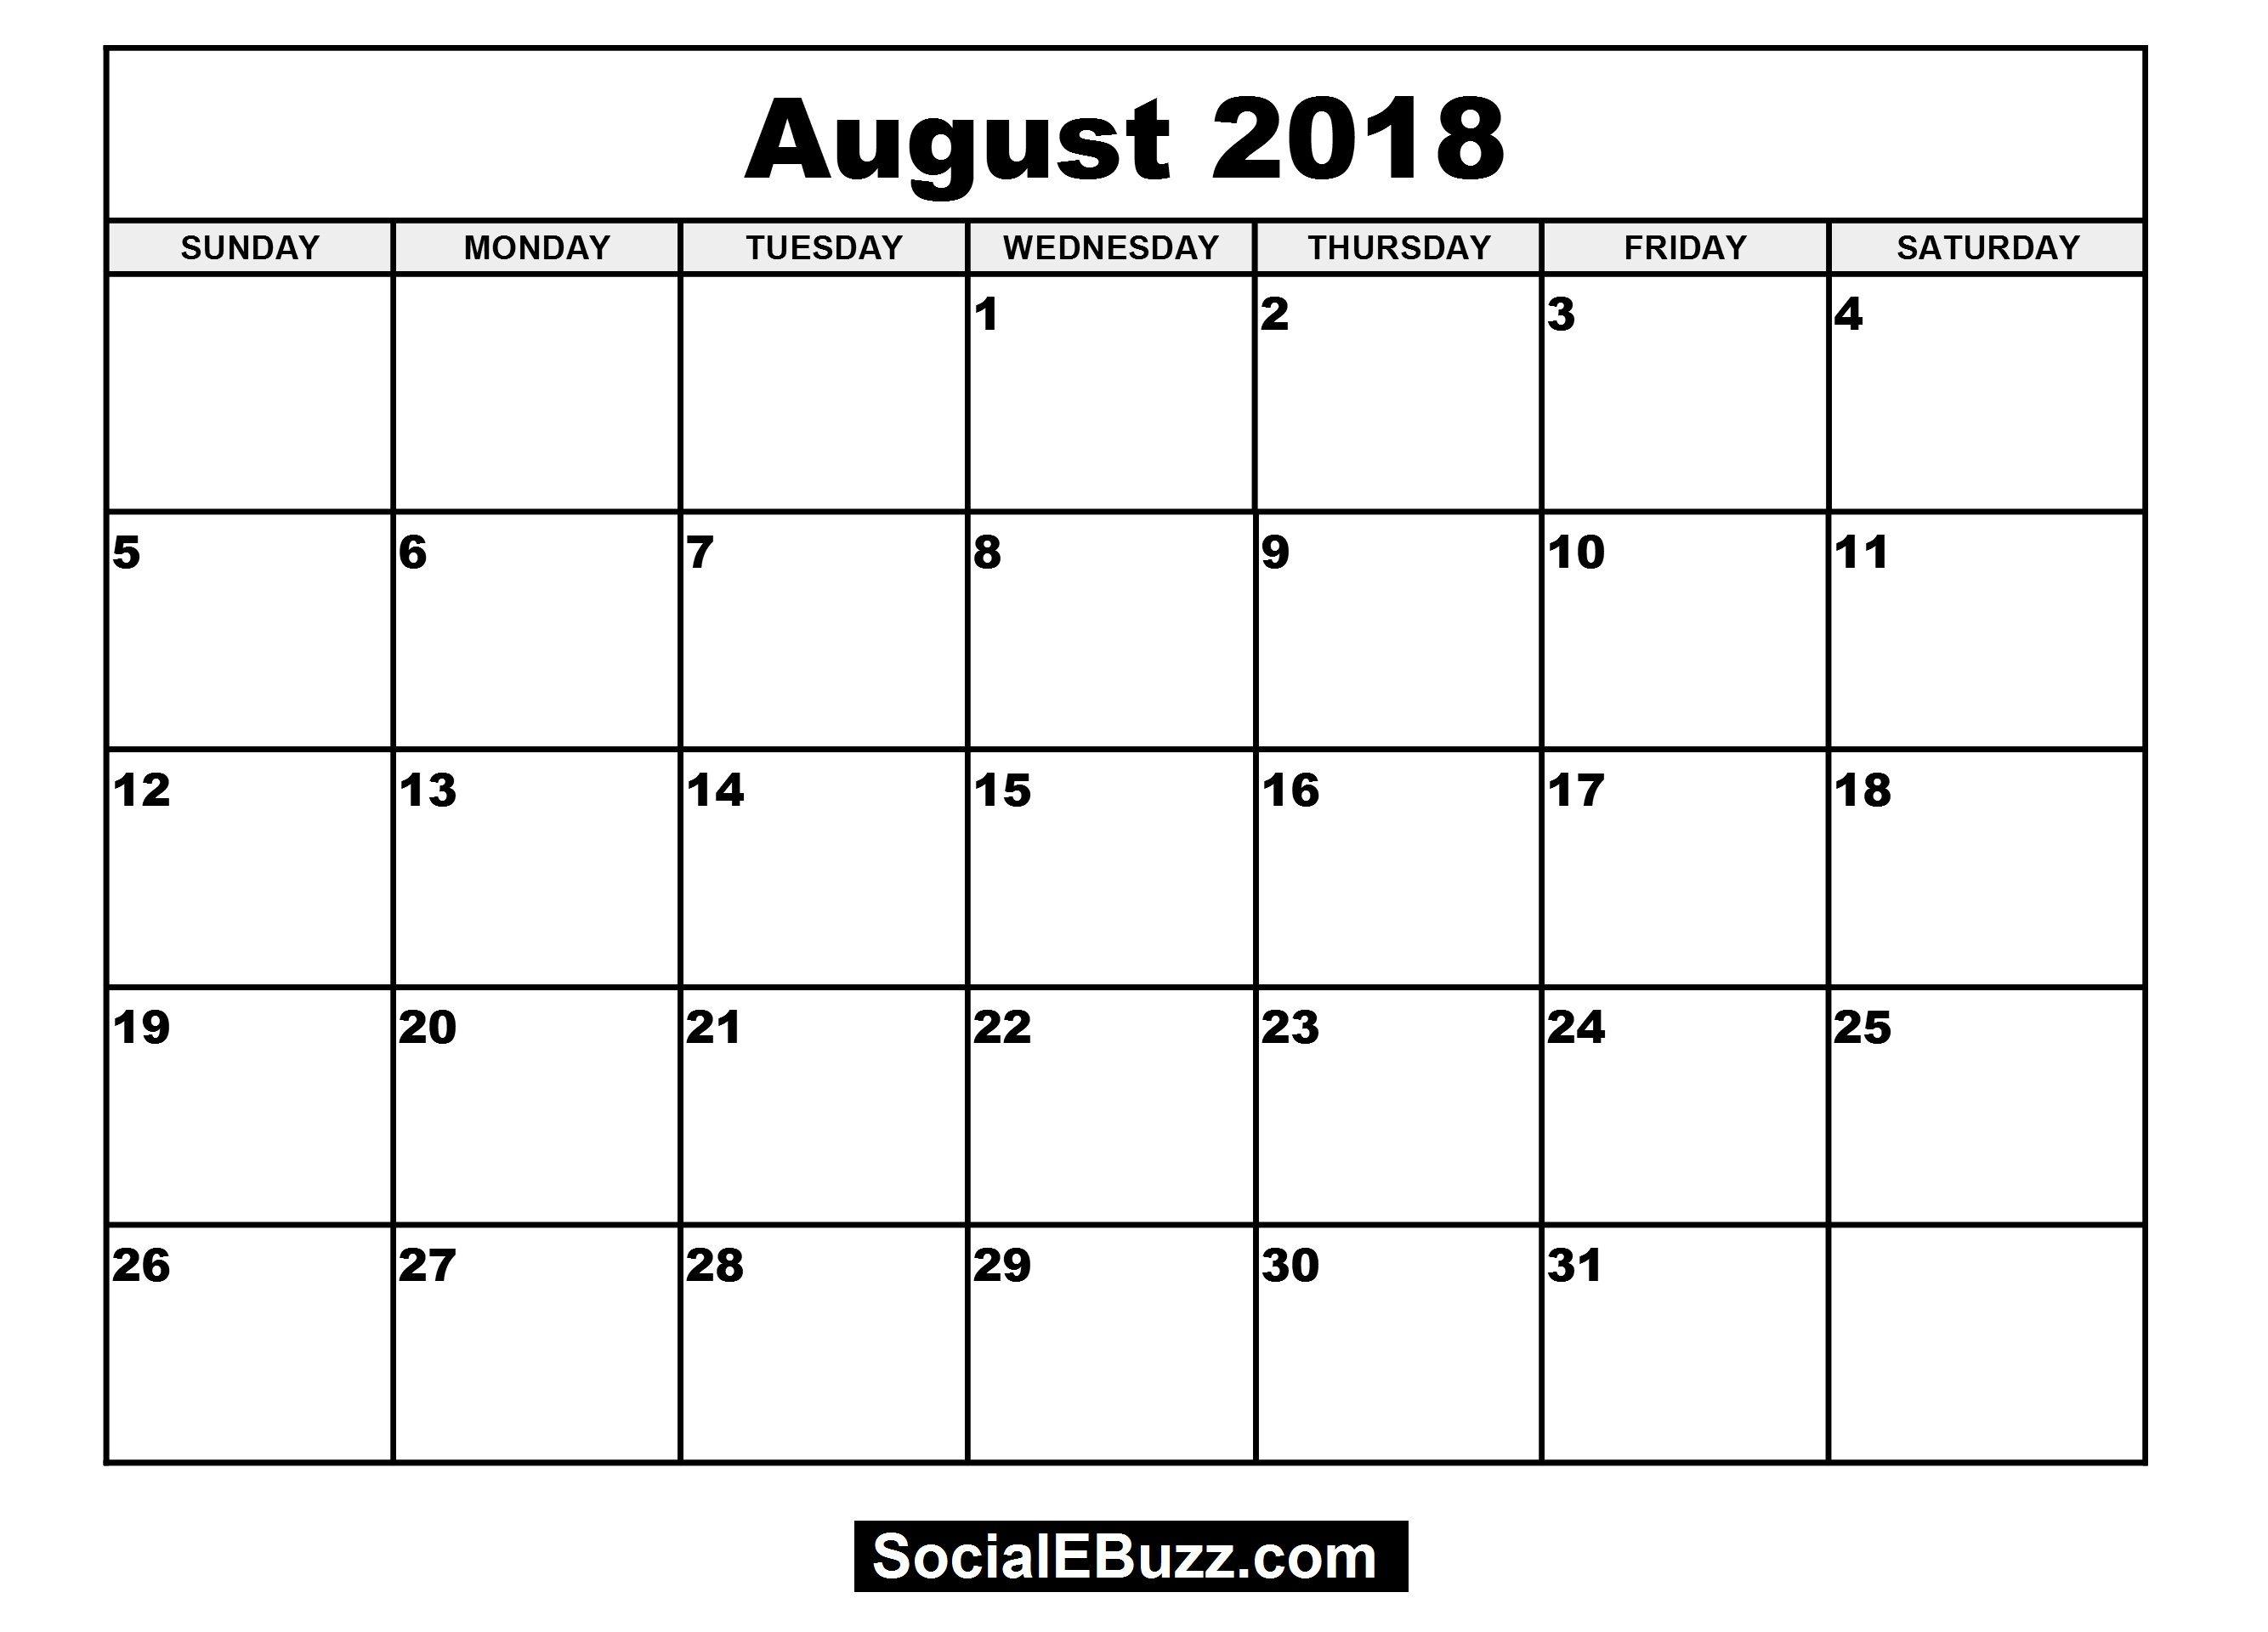 Pincalendar Printable On August 2018 Calendar | 2018 Calendar for Printable Monthly Calendar Template Aug